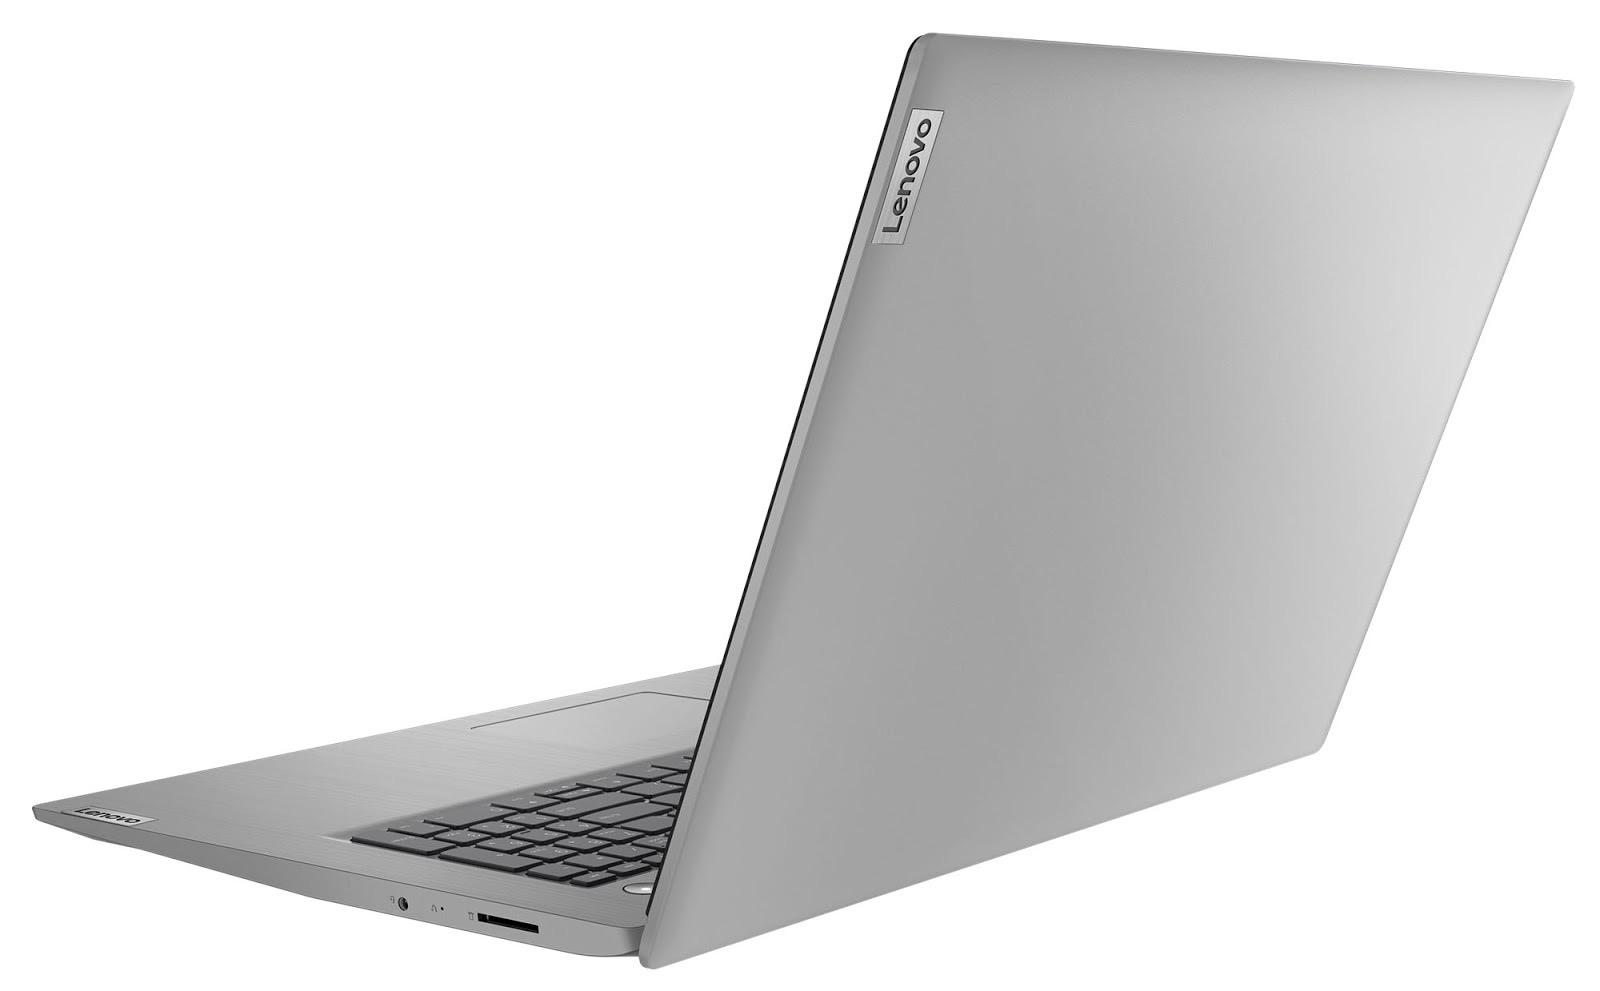 Фото 1. Ноутбук Lenovo ideapad 3 17IML05 Platinum Grey (81WC009MRE)